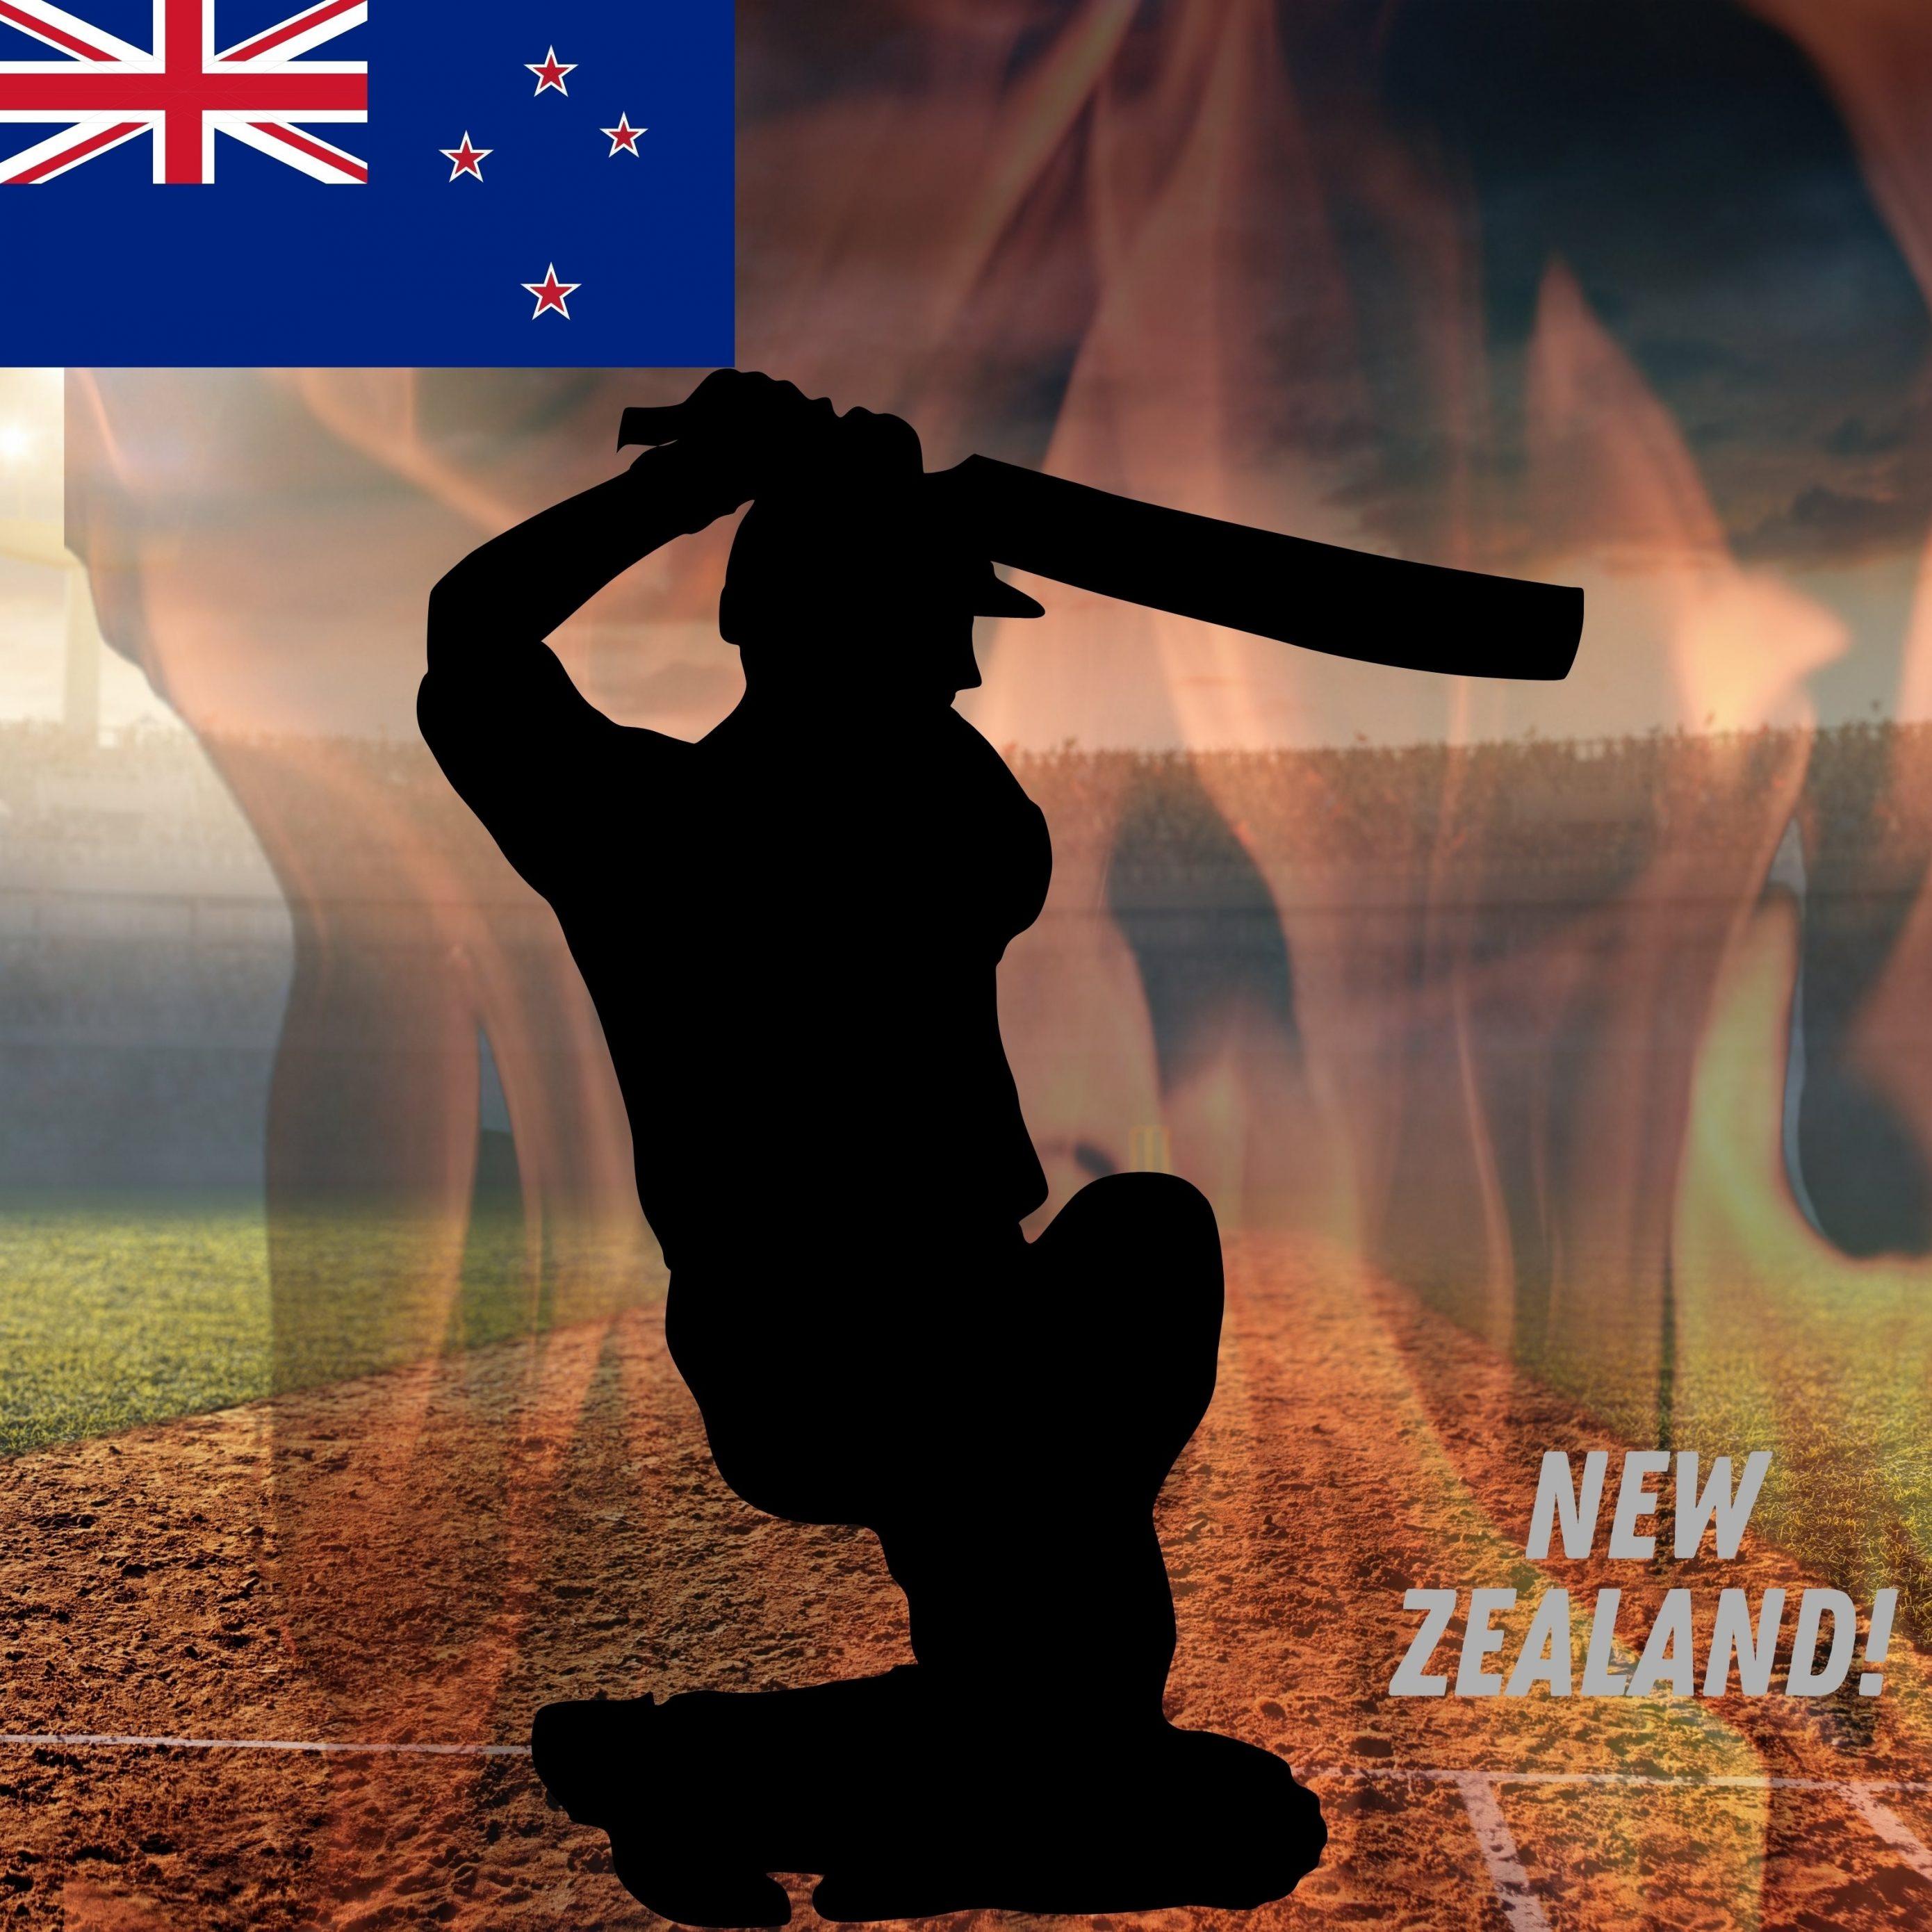 2780x2780 Parallax wallpaper 4k New Zealand Cricket Stadium iPad Wallpaper 2780x2780 pixels resolution